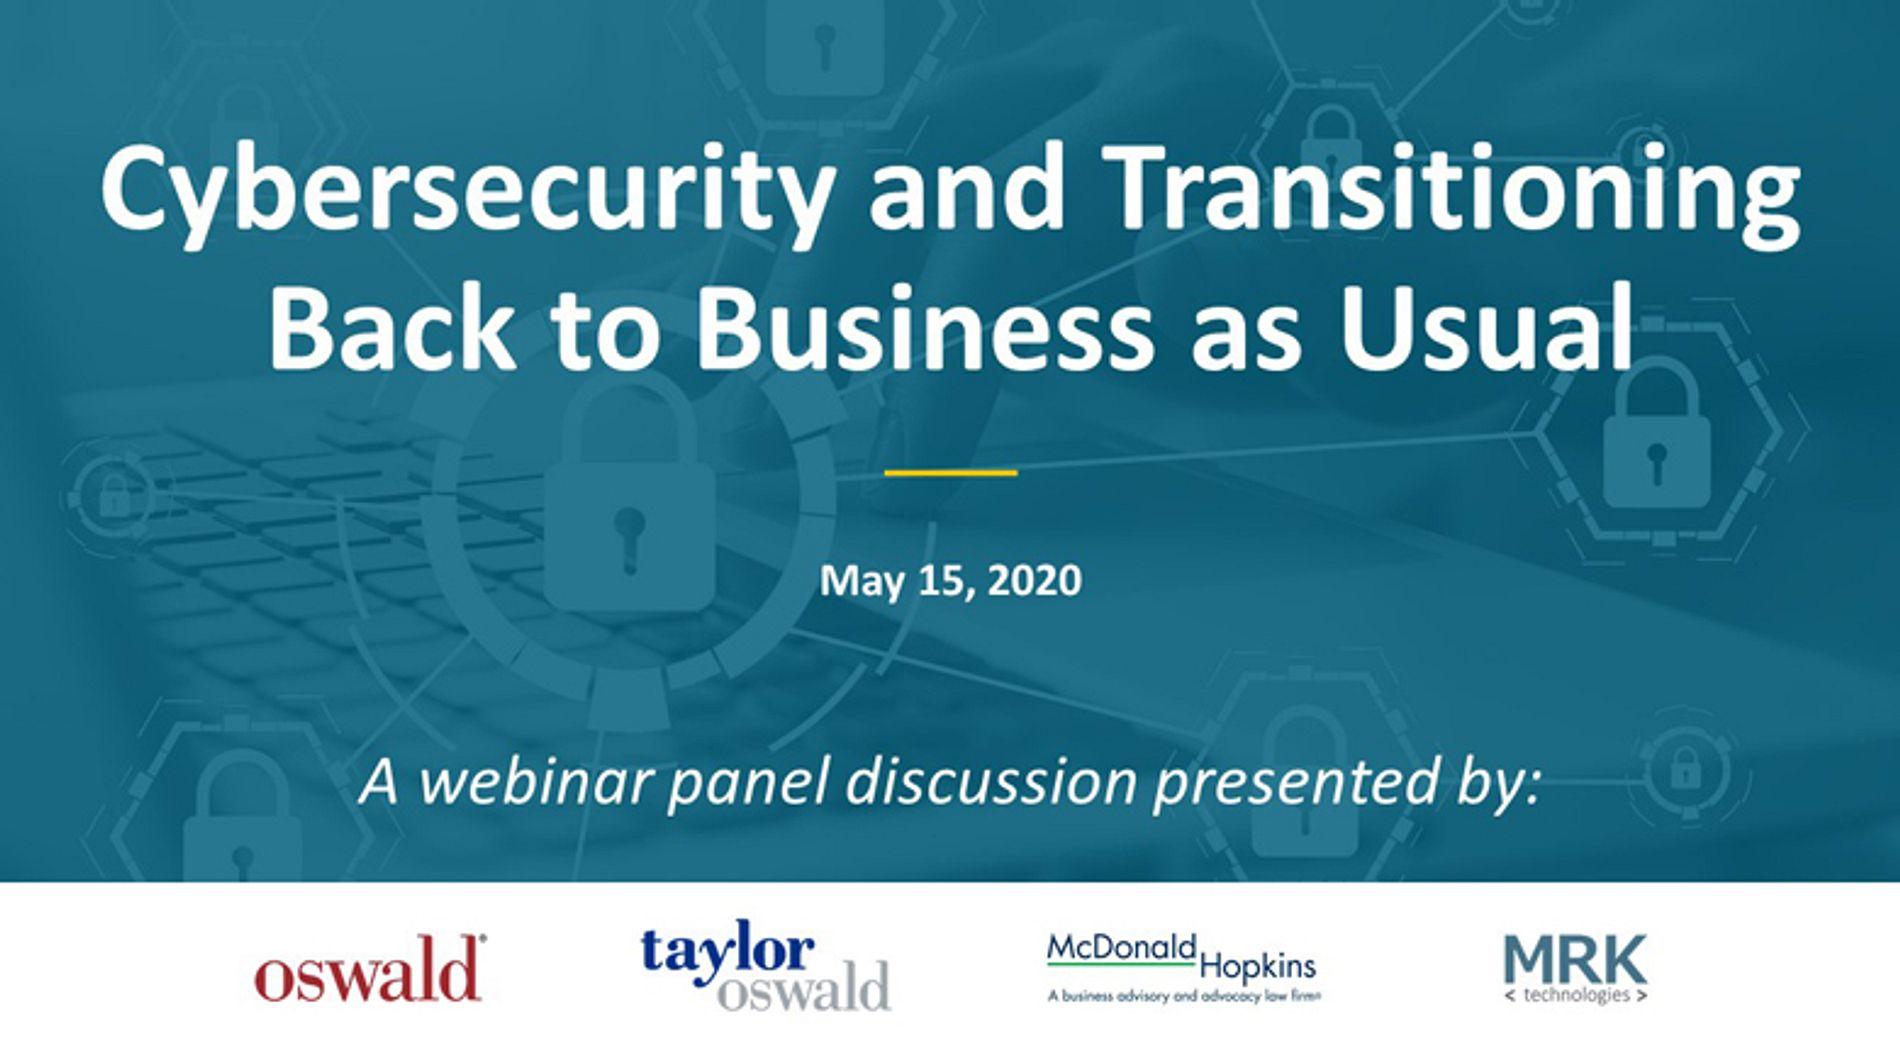 Cybersecurity May 15 Webinar